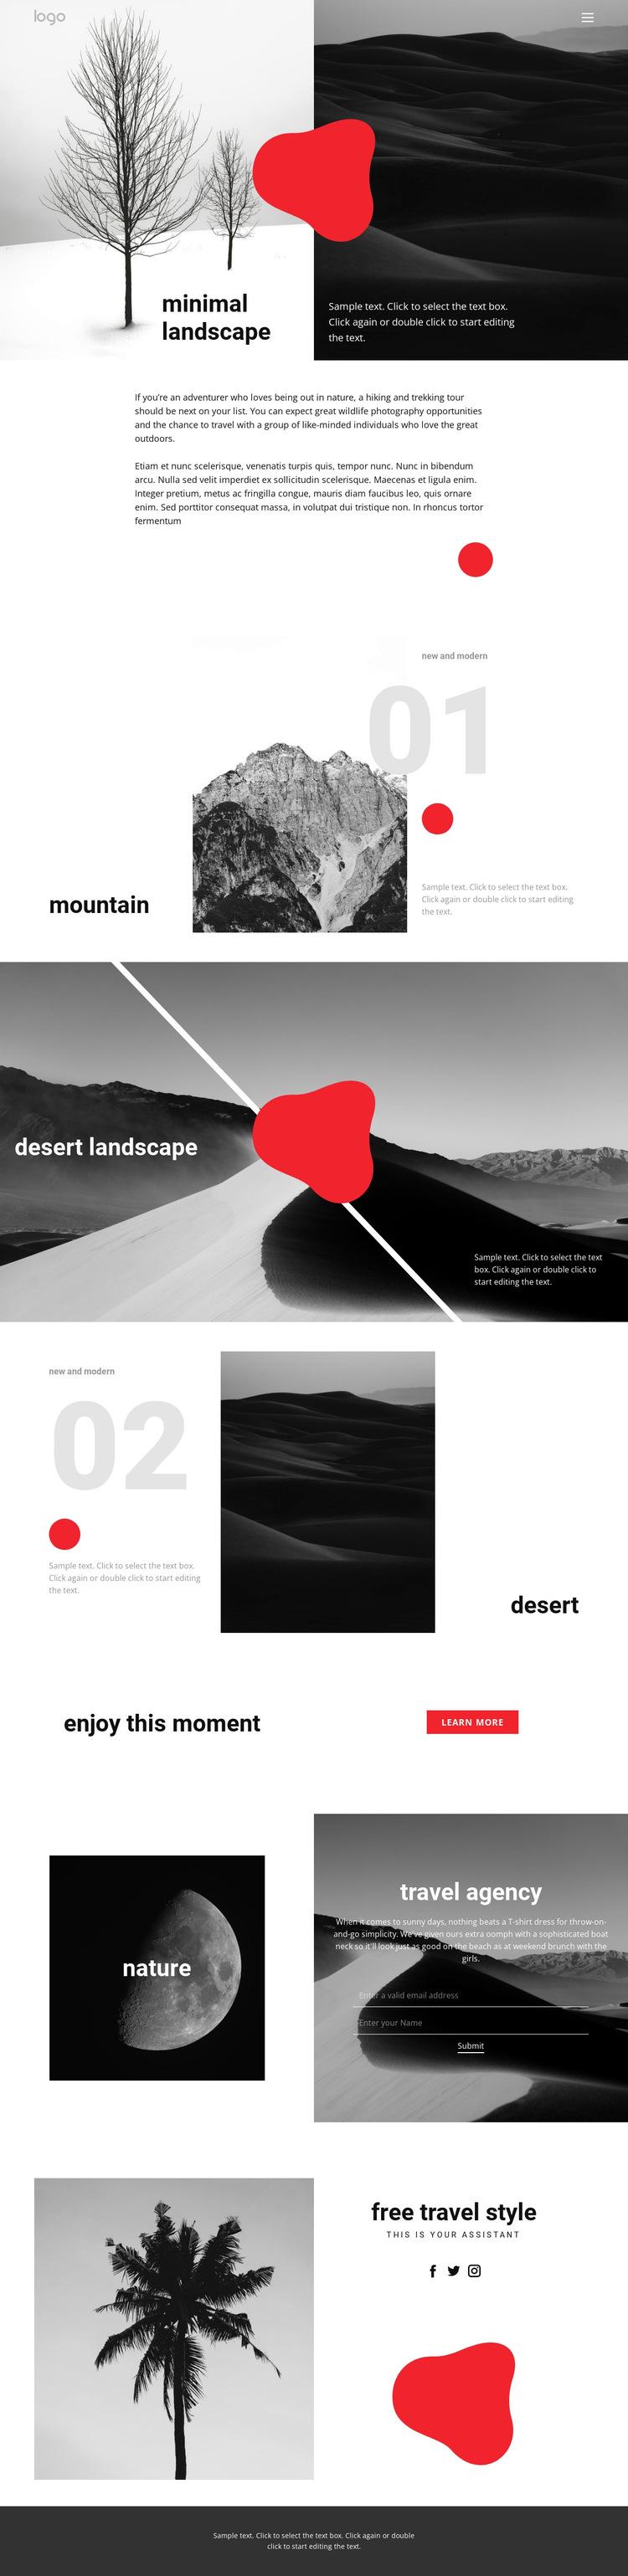 Minimal landscape photo HTML5 Template